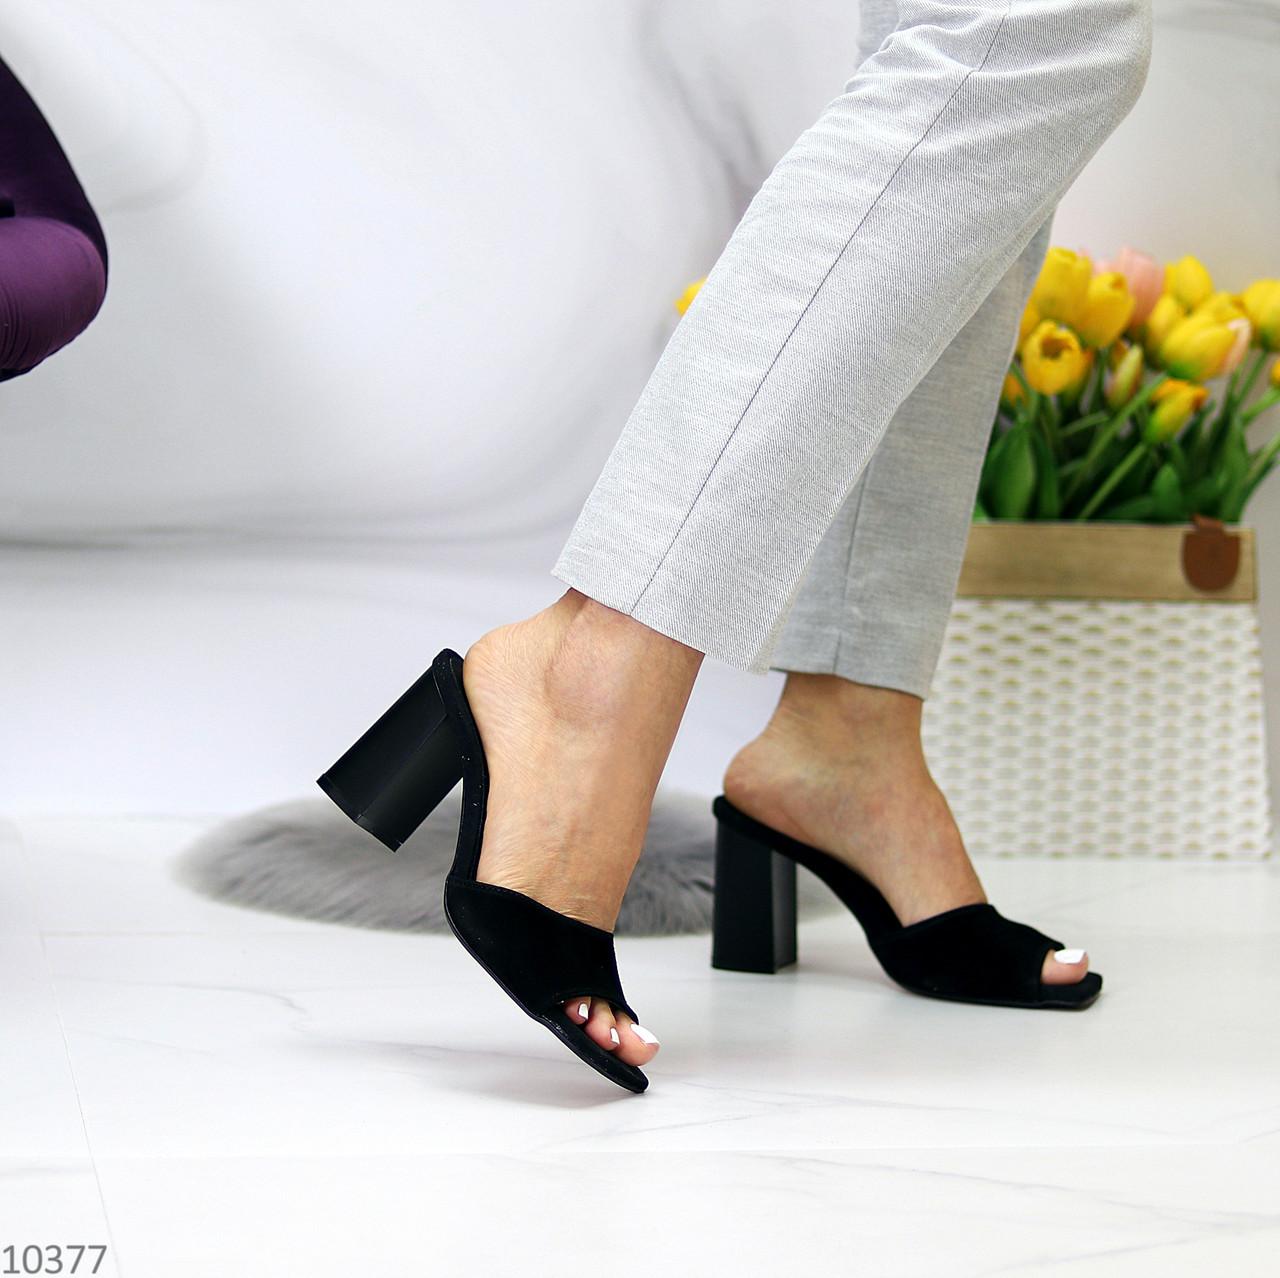 Шлепанцы / сабо женские черные на каблуке 9,5 см натуральная замш